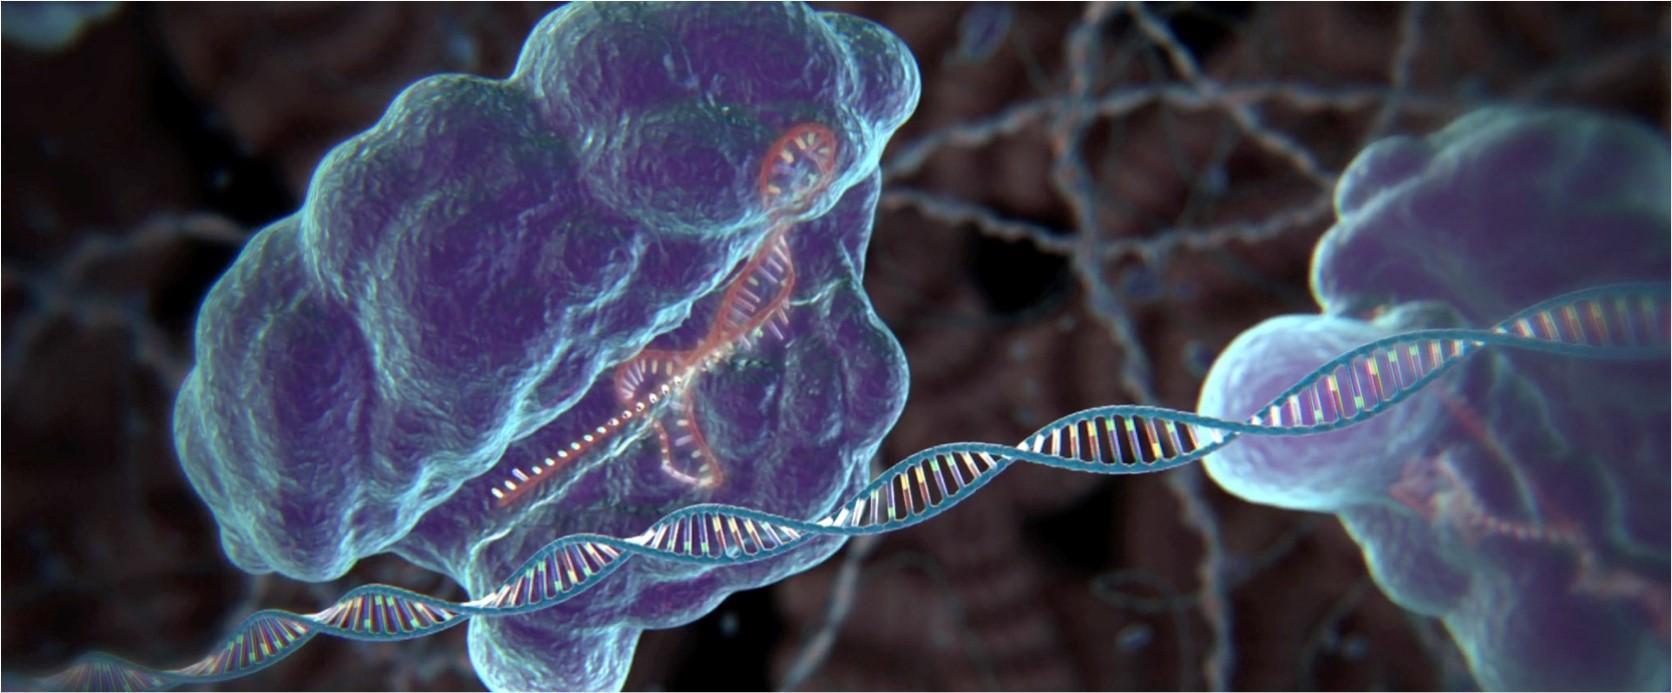 Editing Genomes with CRISPR